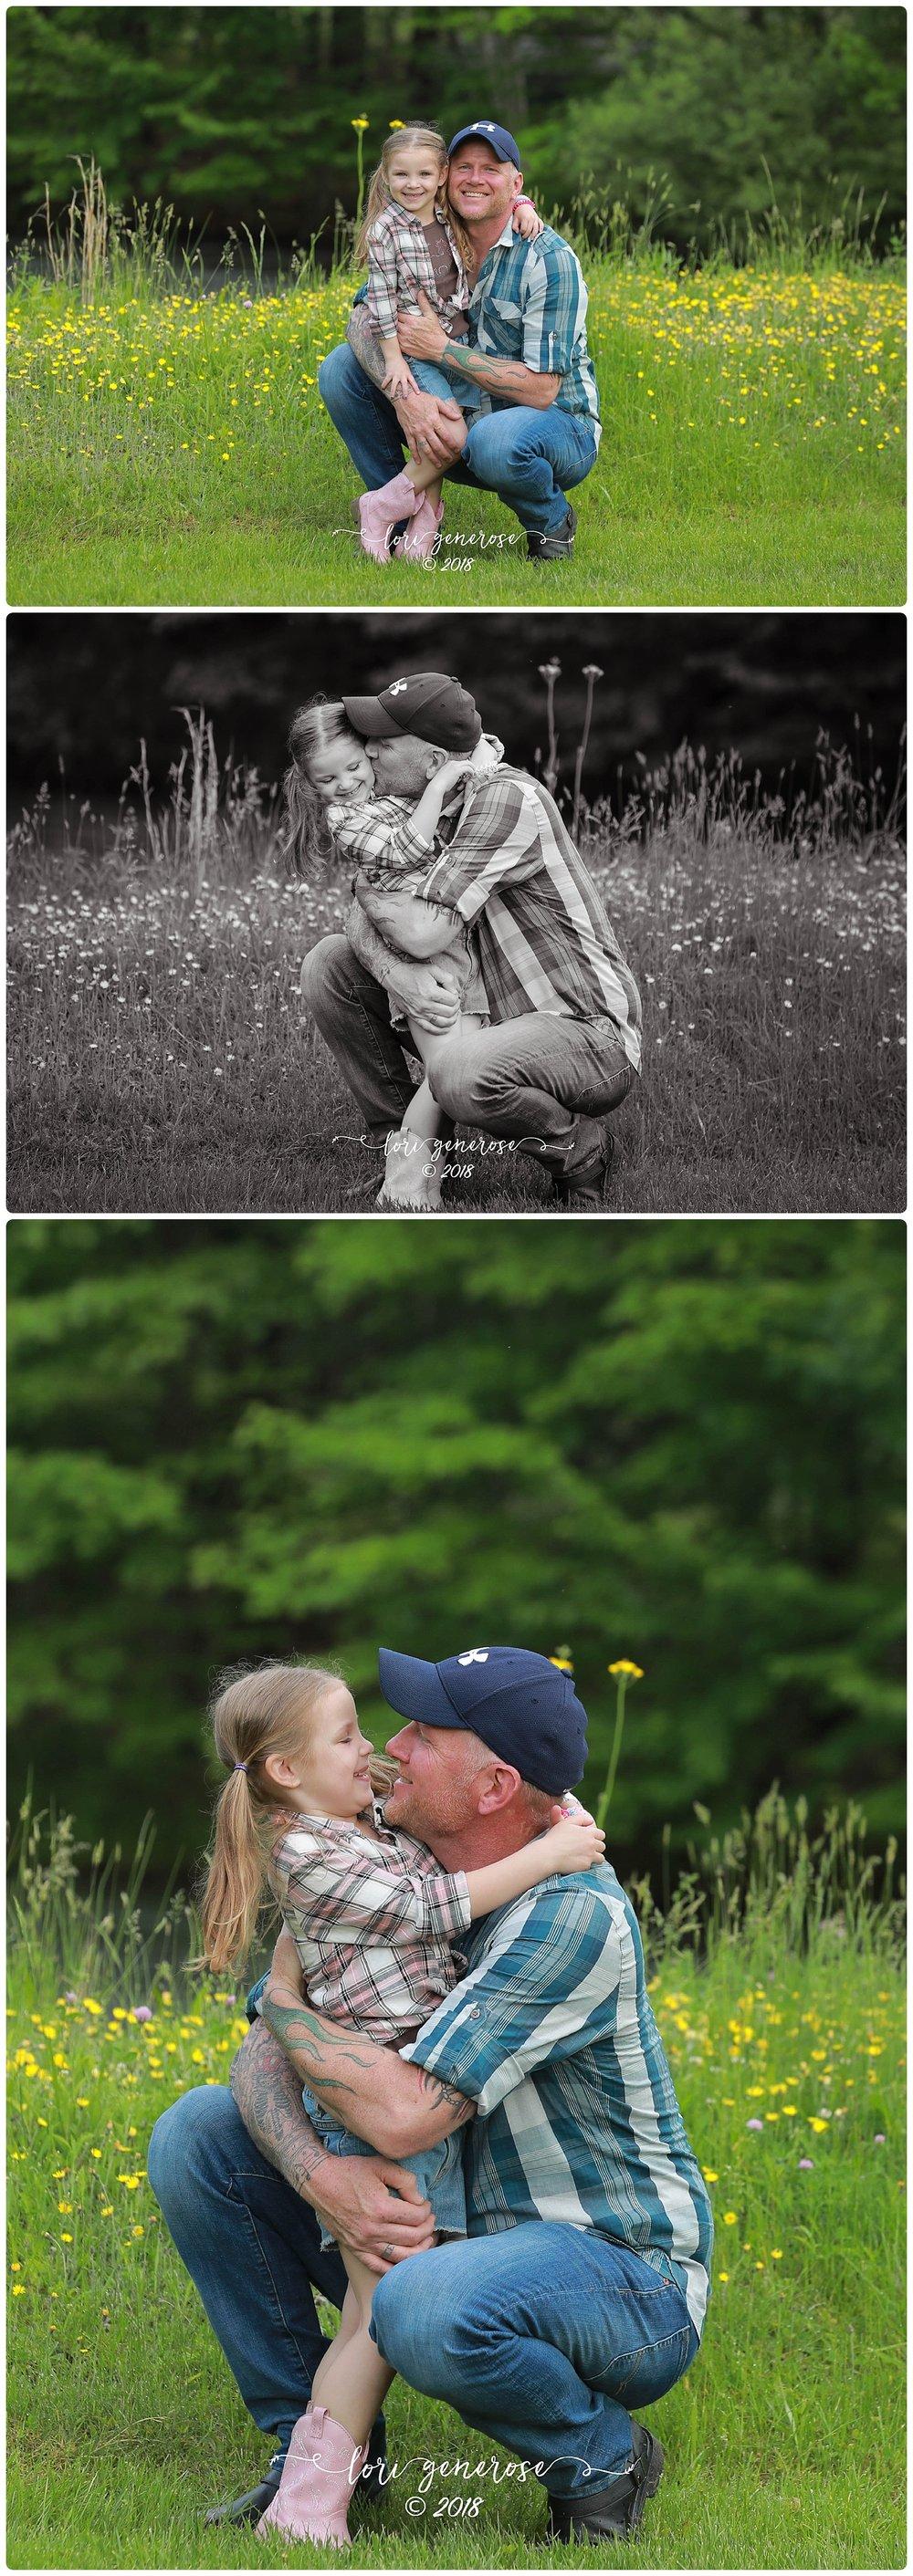 lgphotographylorigeneroseoutdooronlocationfamilysessionhorsefarmfatherdaughter.jpg